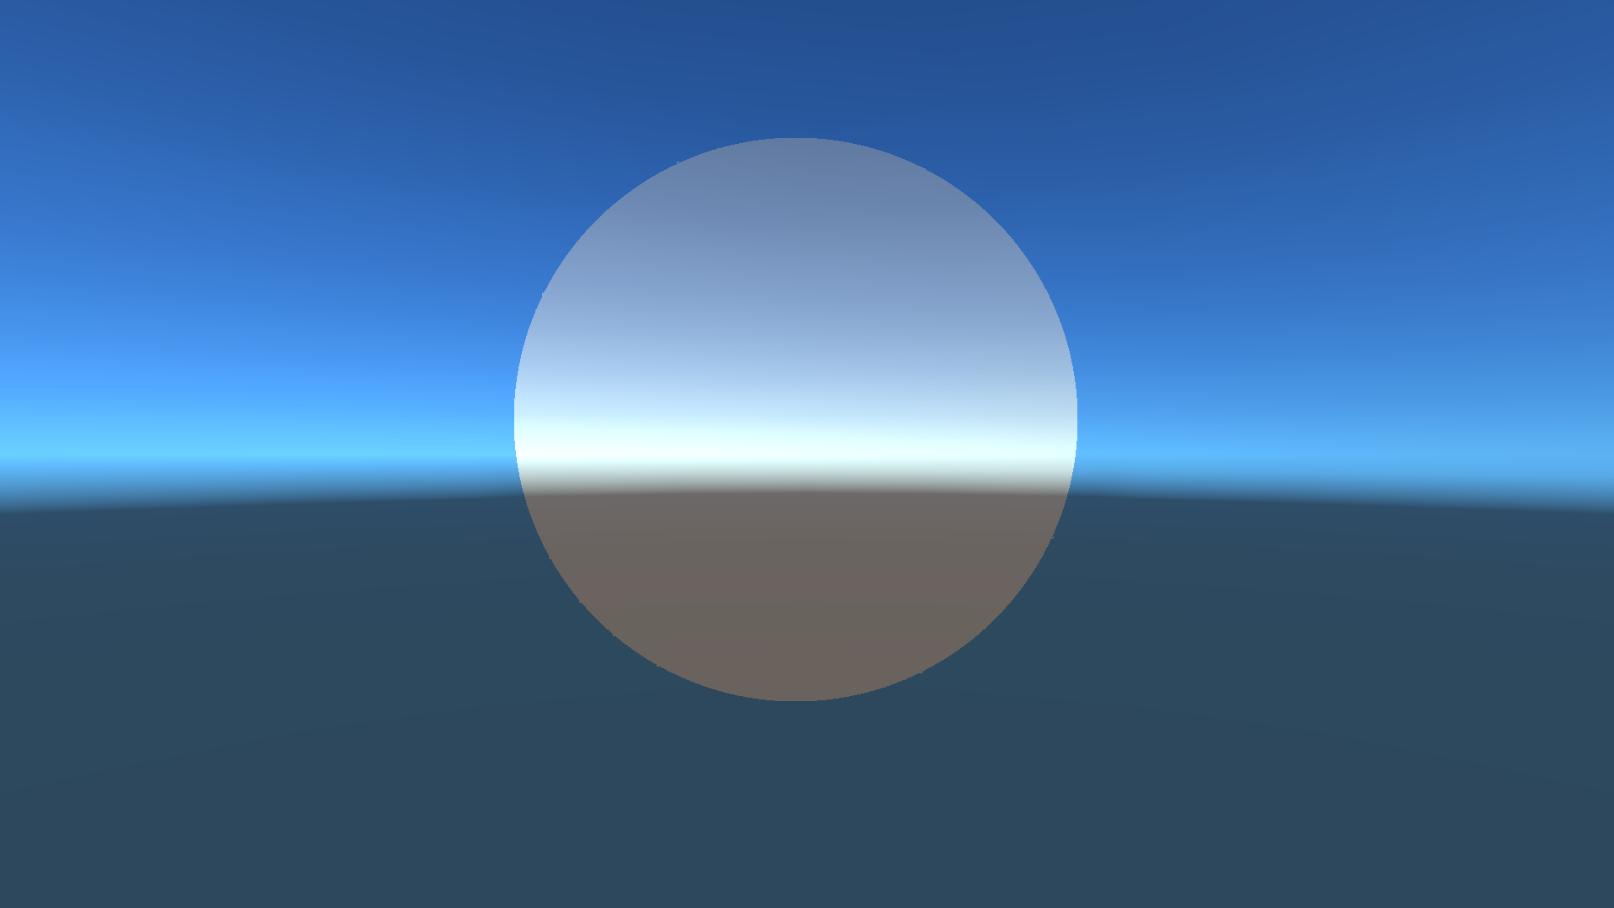 GitHub - JPBotelho/Unity-Camera-cutout: A Cutout FX for unity